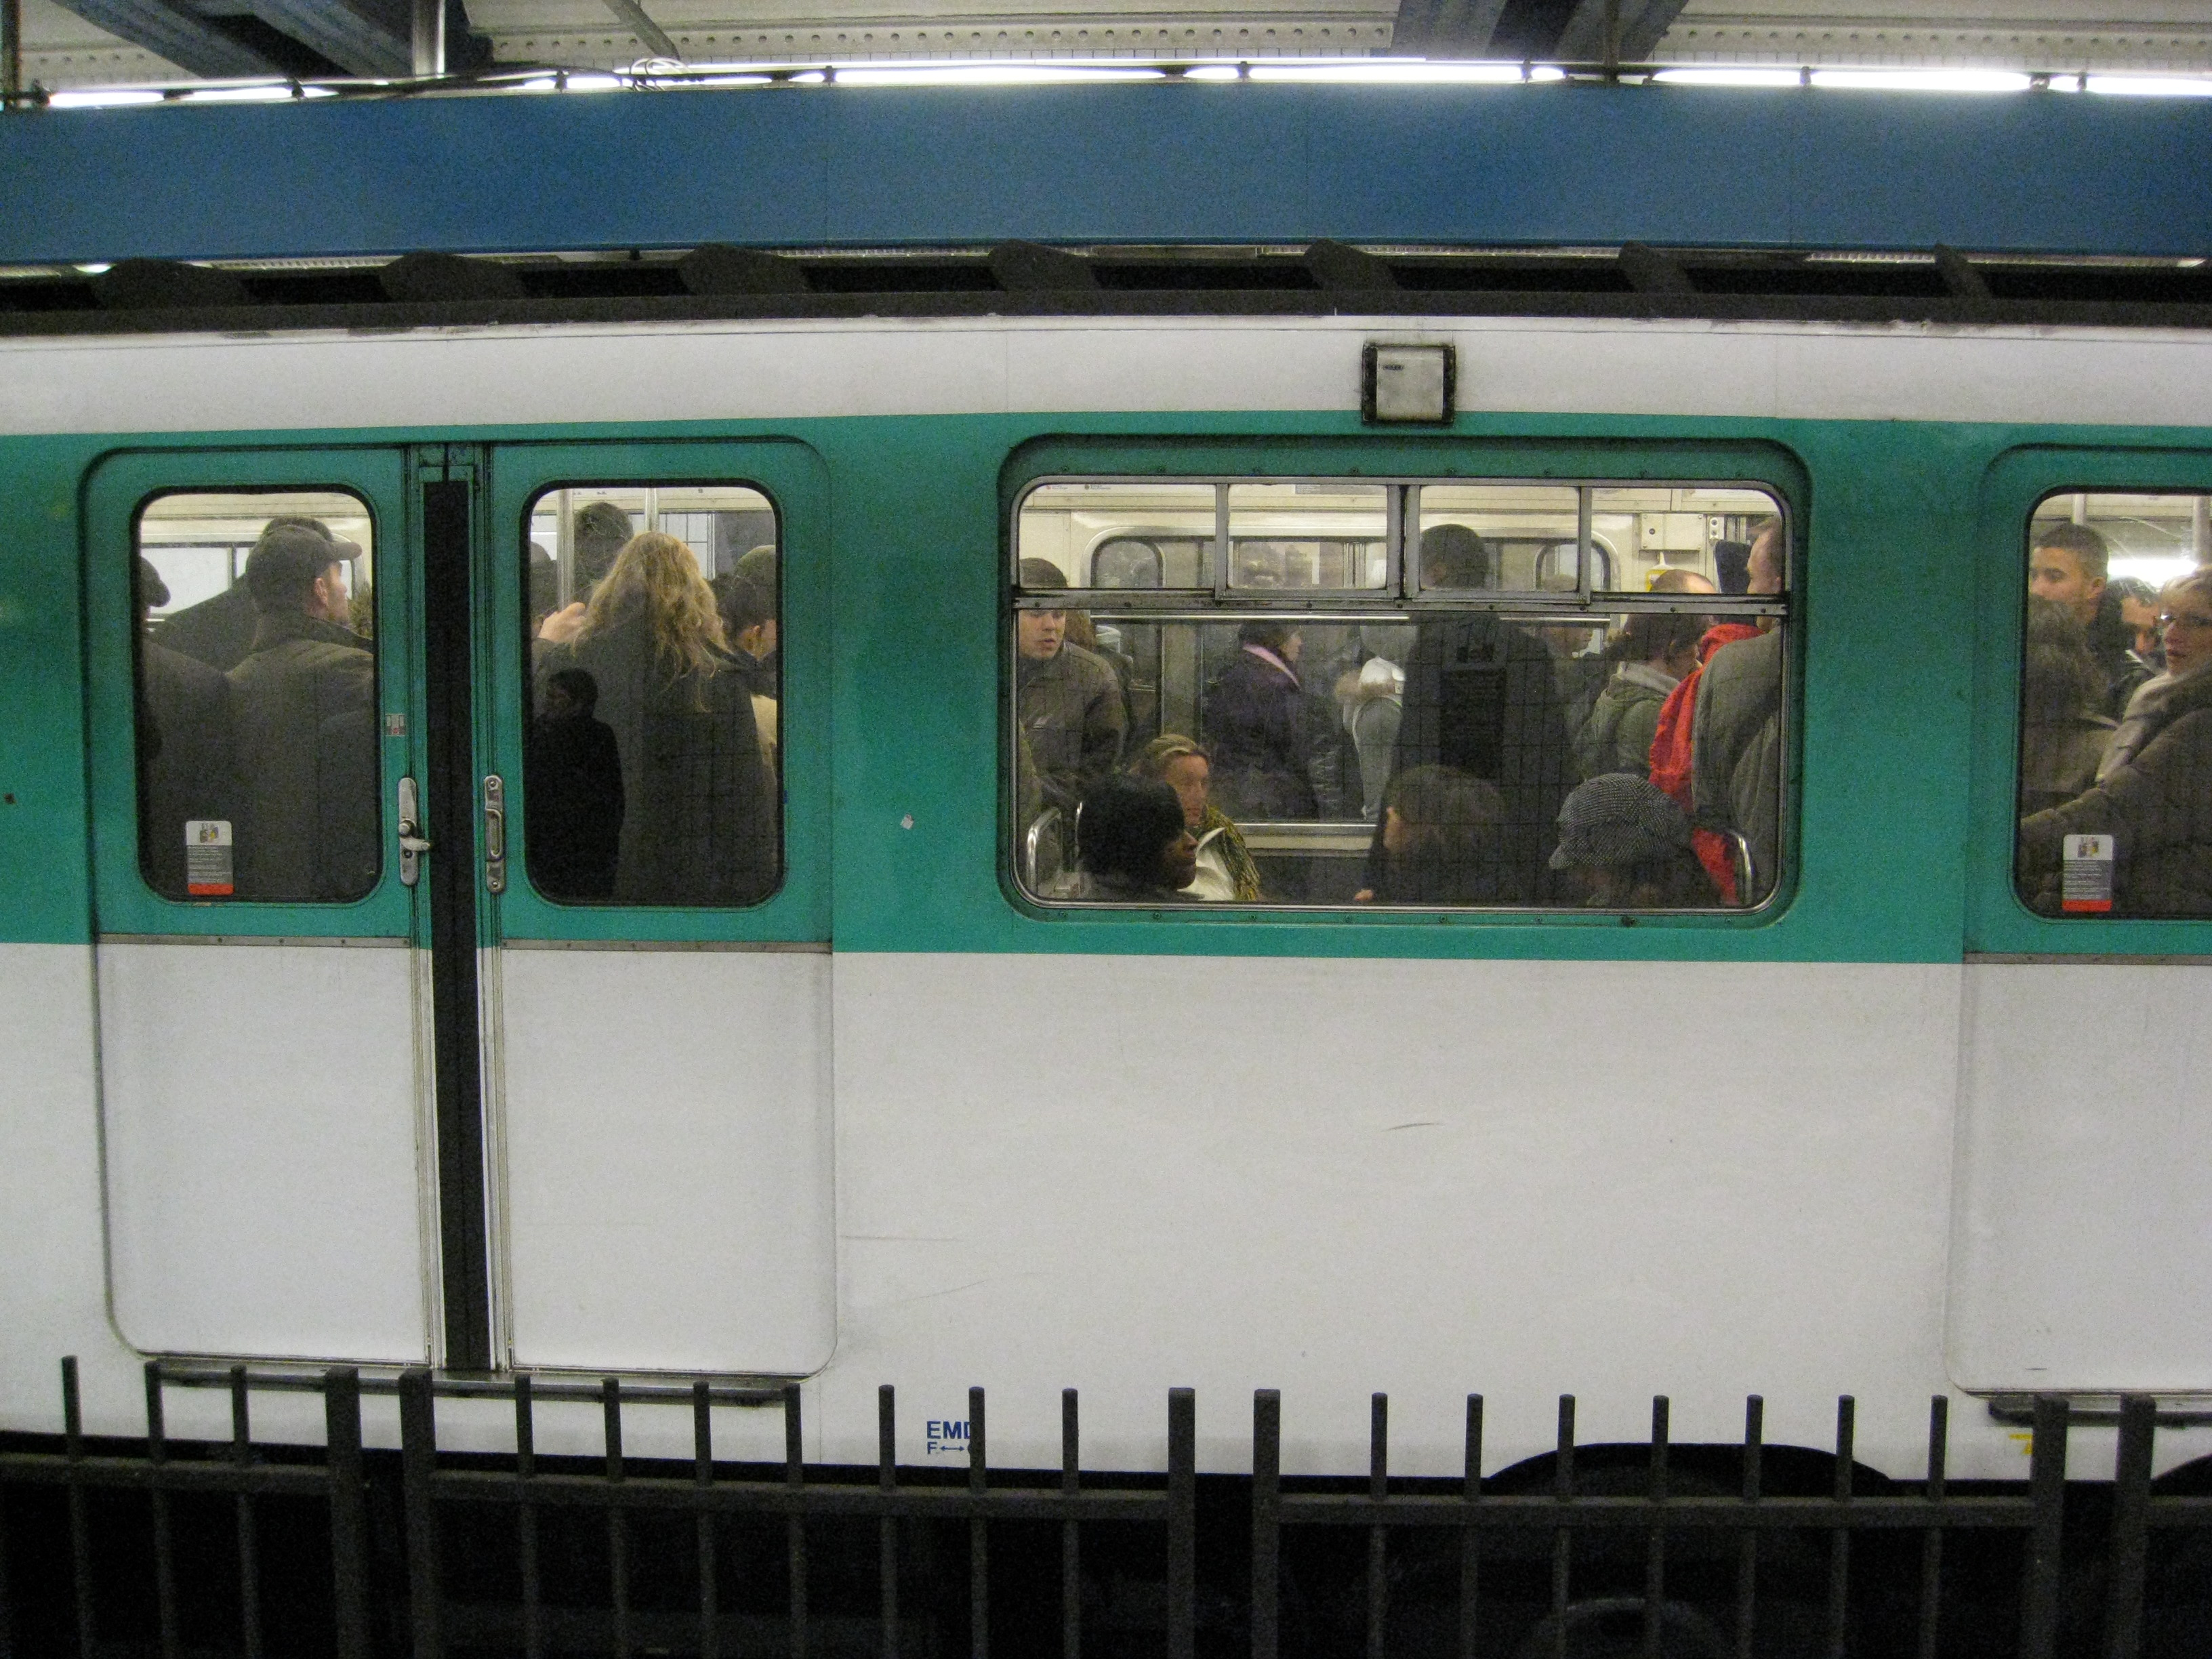 File strasbourg saint denis line 4 m tro station - Lidl strasbourg saint denis ...